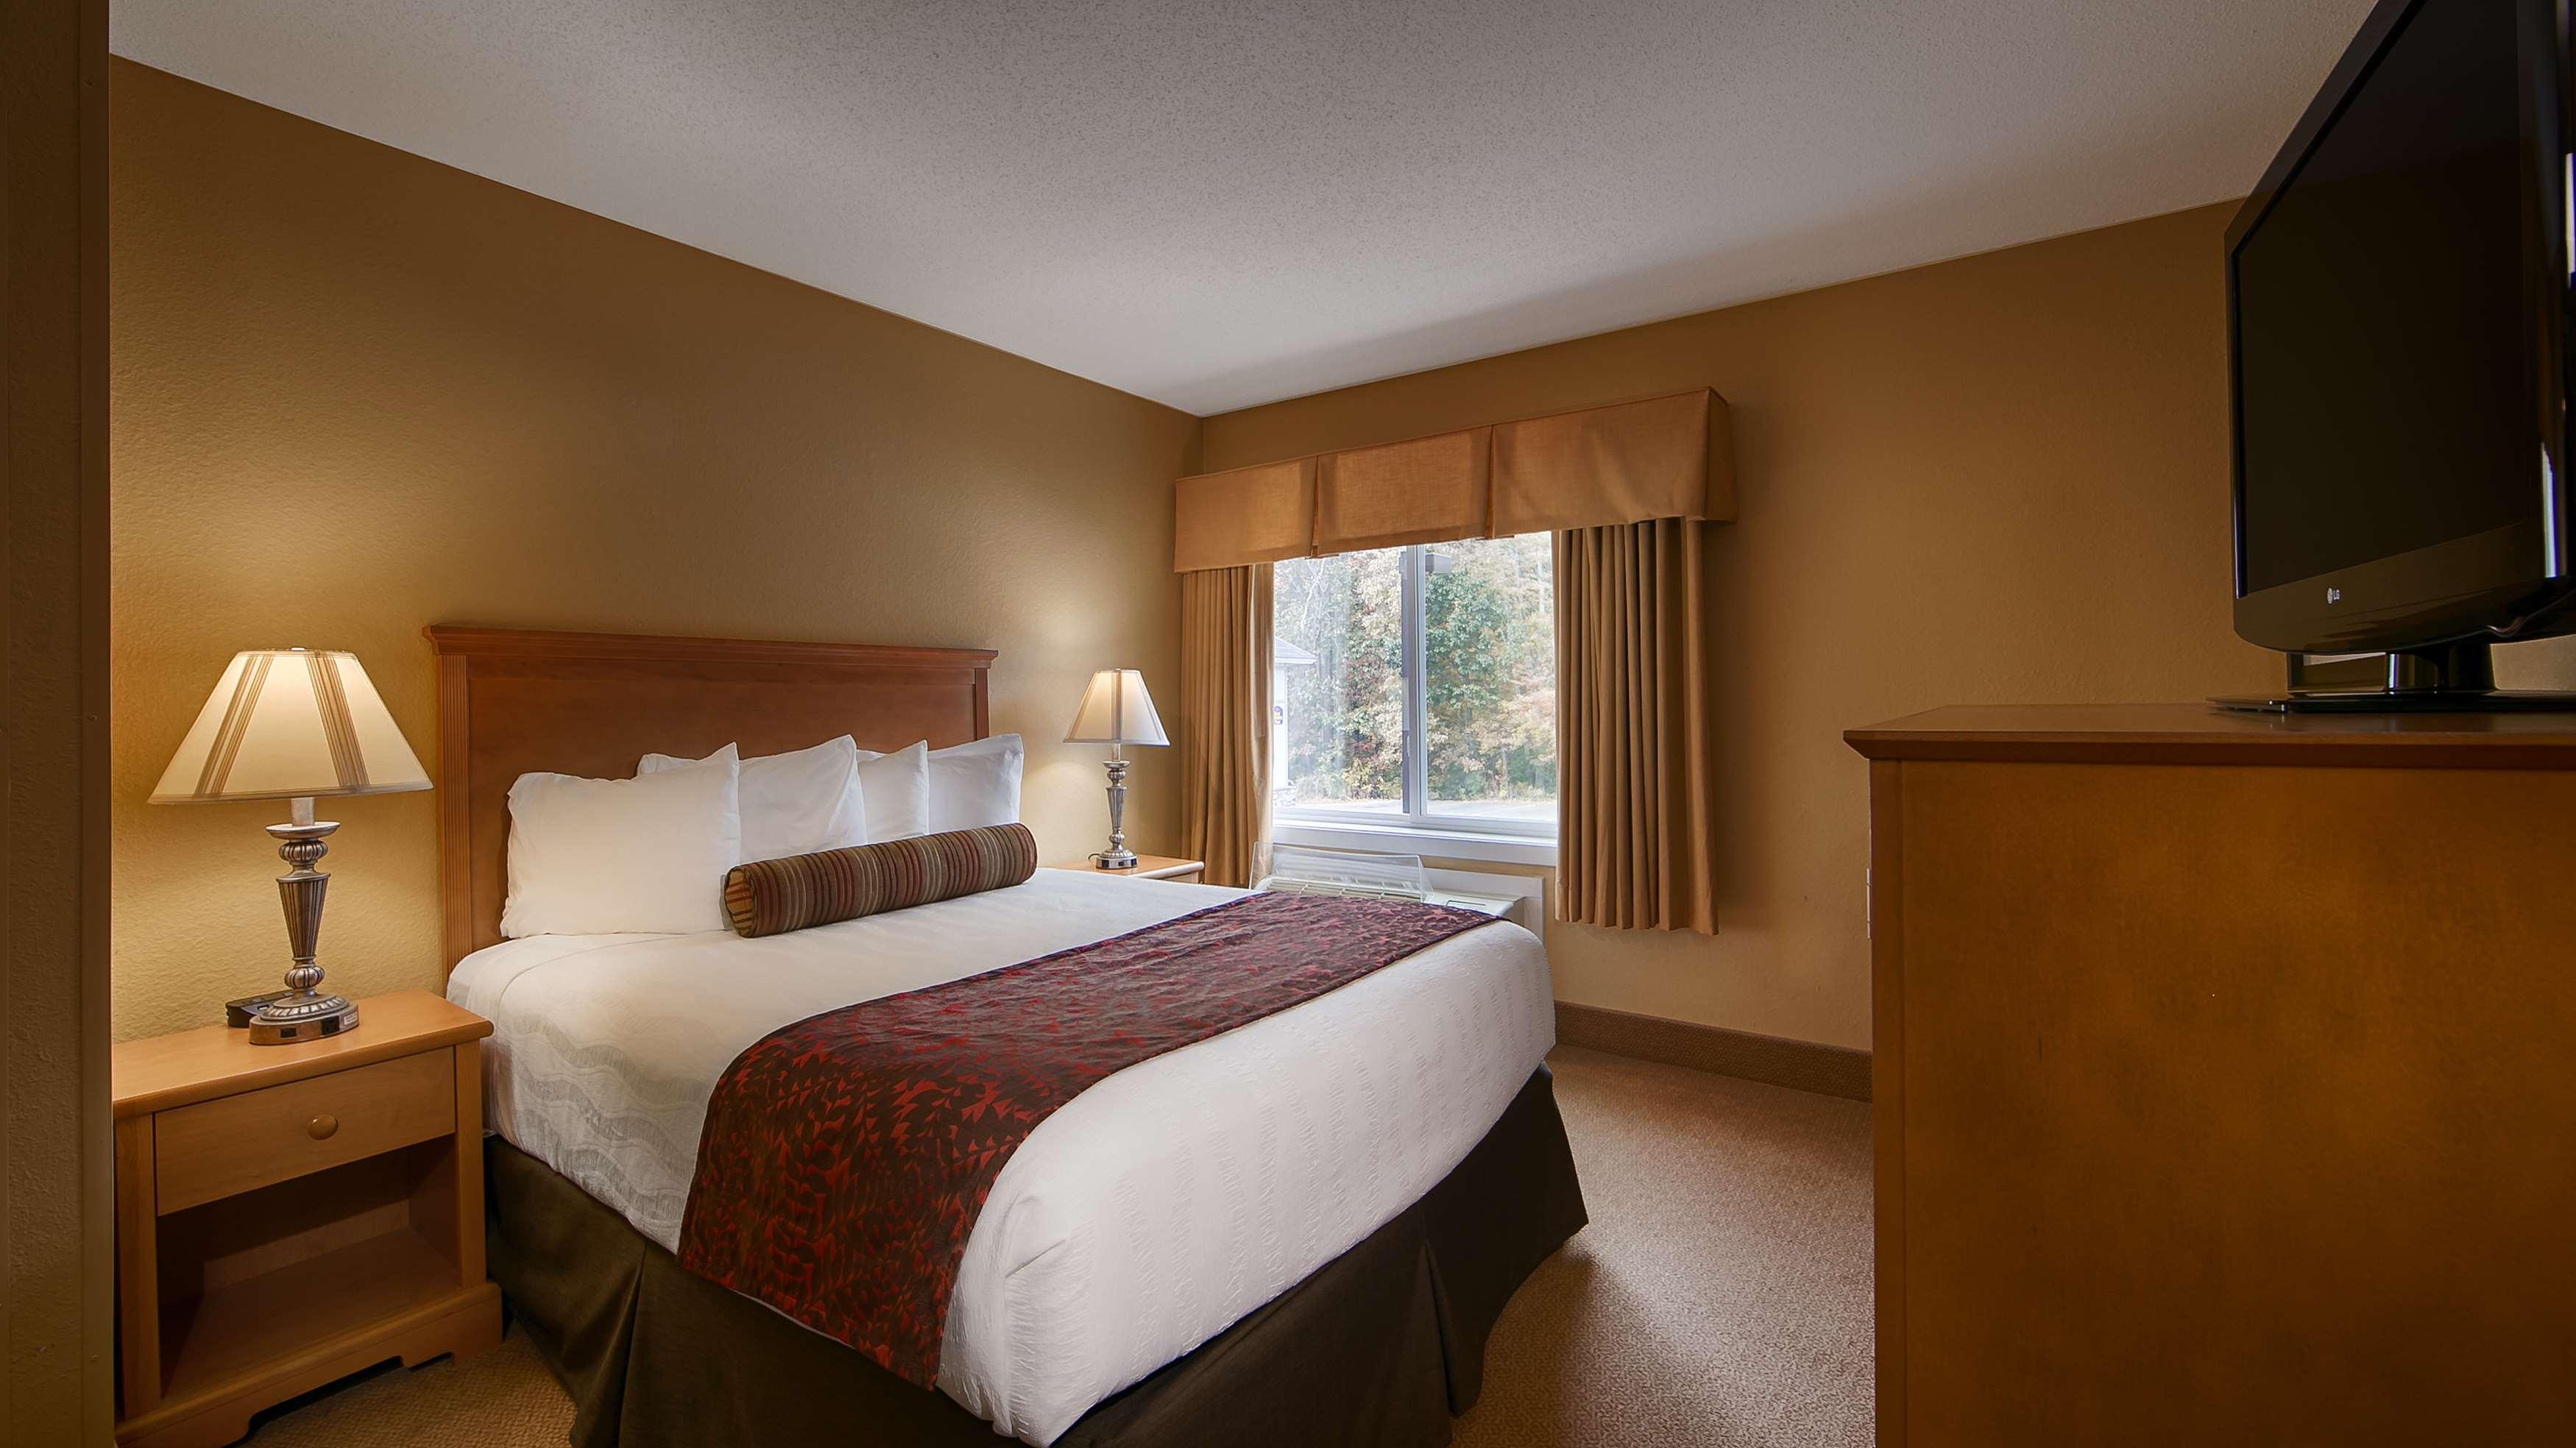 Best Western Plus Windjammer Inn & Conference Center image 28